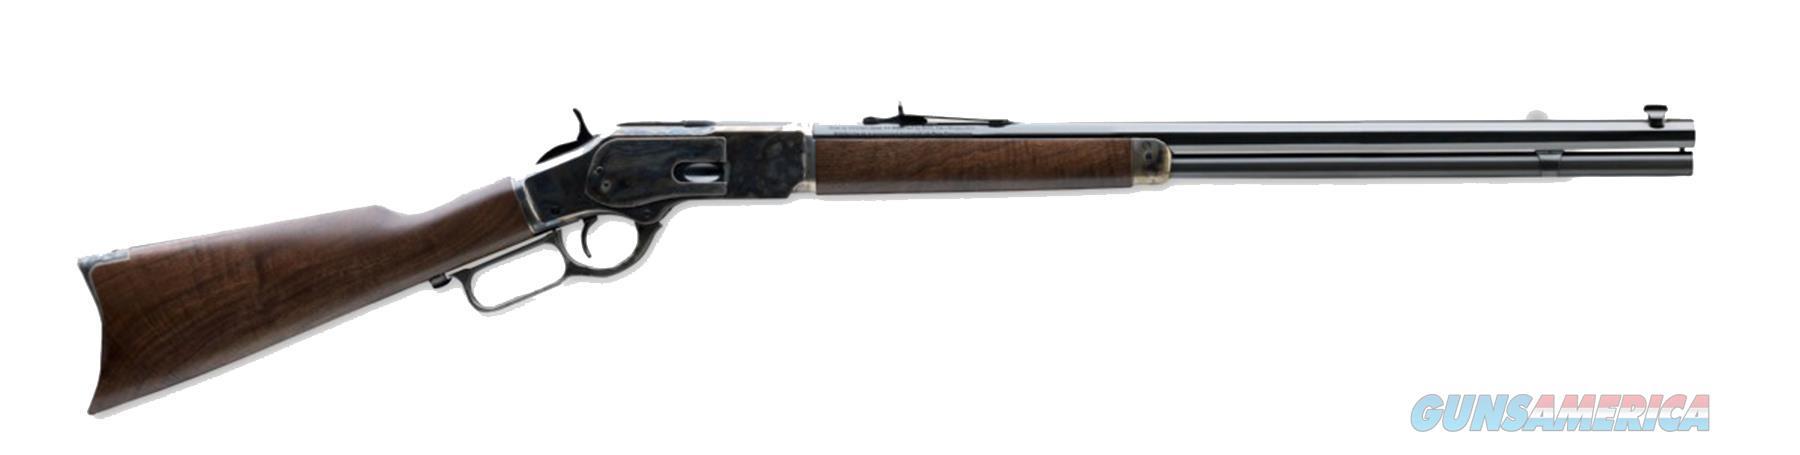 "Winchester Guns 534202141 1873 Short Rifle Case Hardened Lever 45 Colt (Lc) 20"" 10+1 Grade Ii/Iii Walnut Stk Blued 534202141  Guns > Rifles > W Misc Rifles"